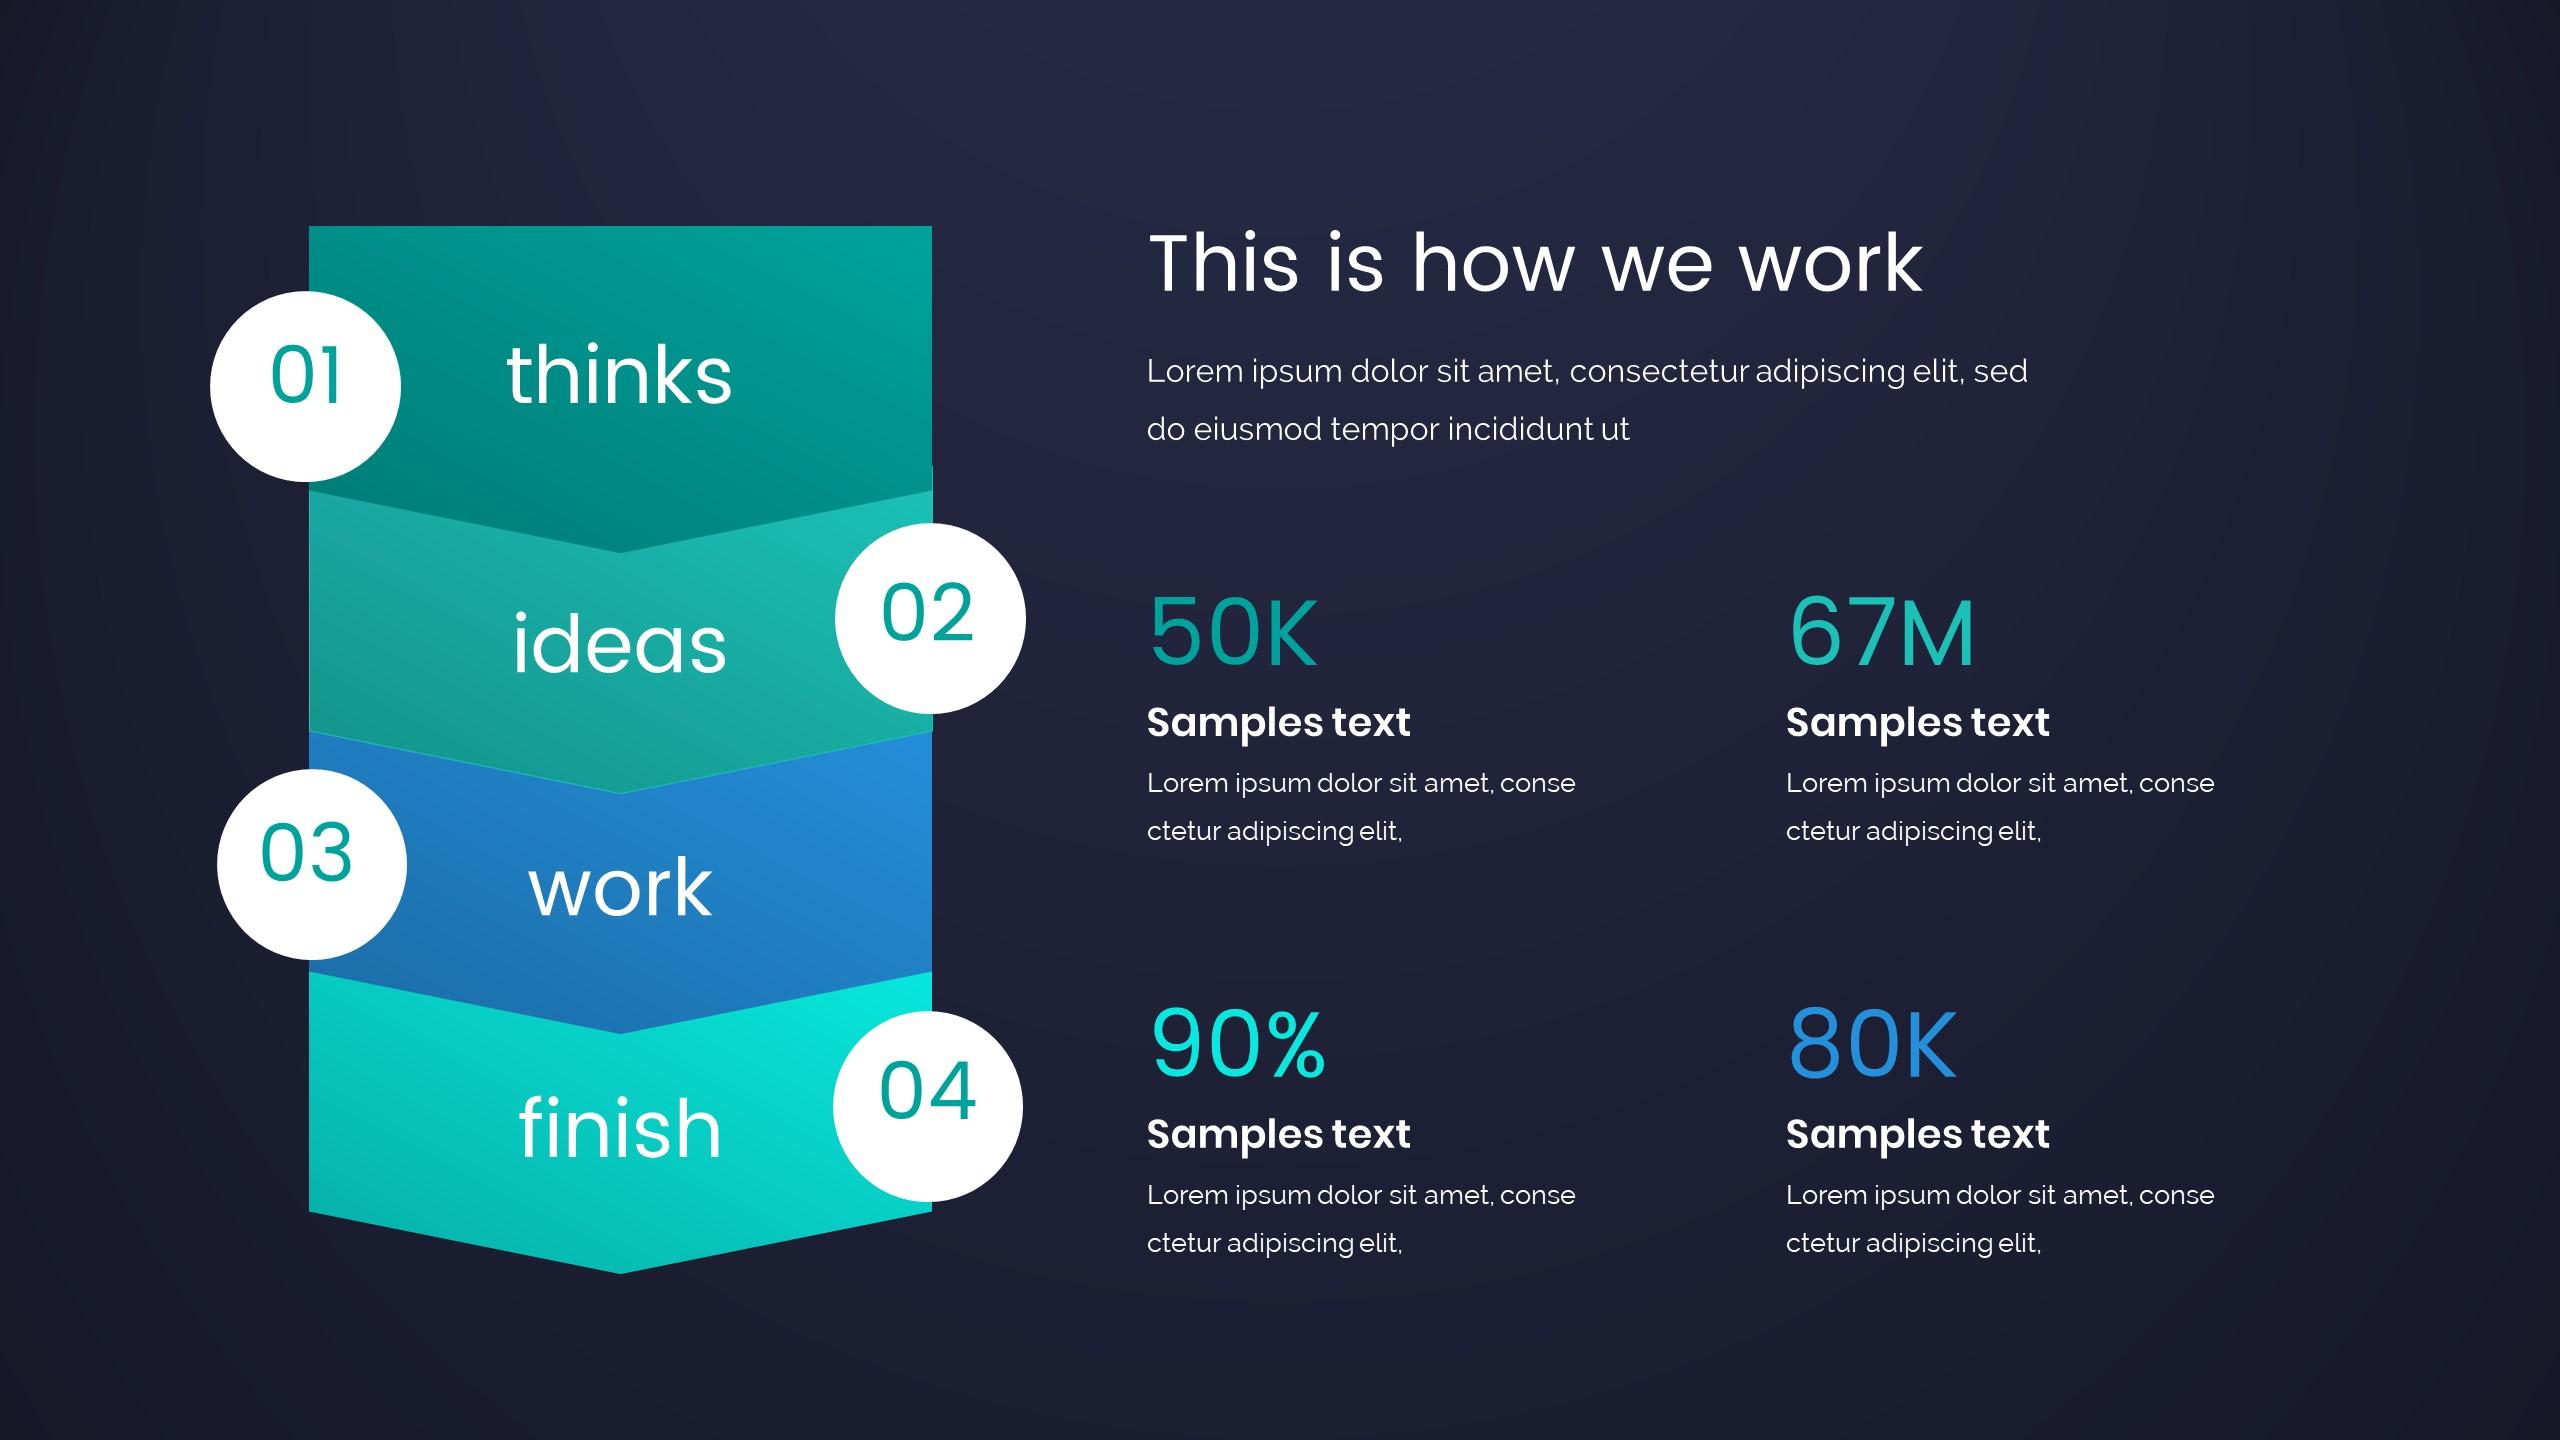 Digital Marketing Pro Design Powerpoint Template by 69slides ...